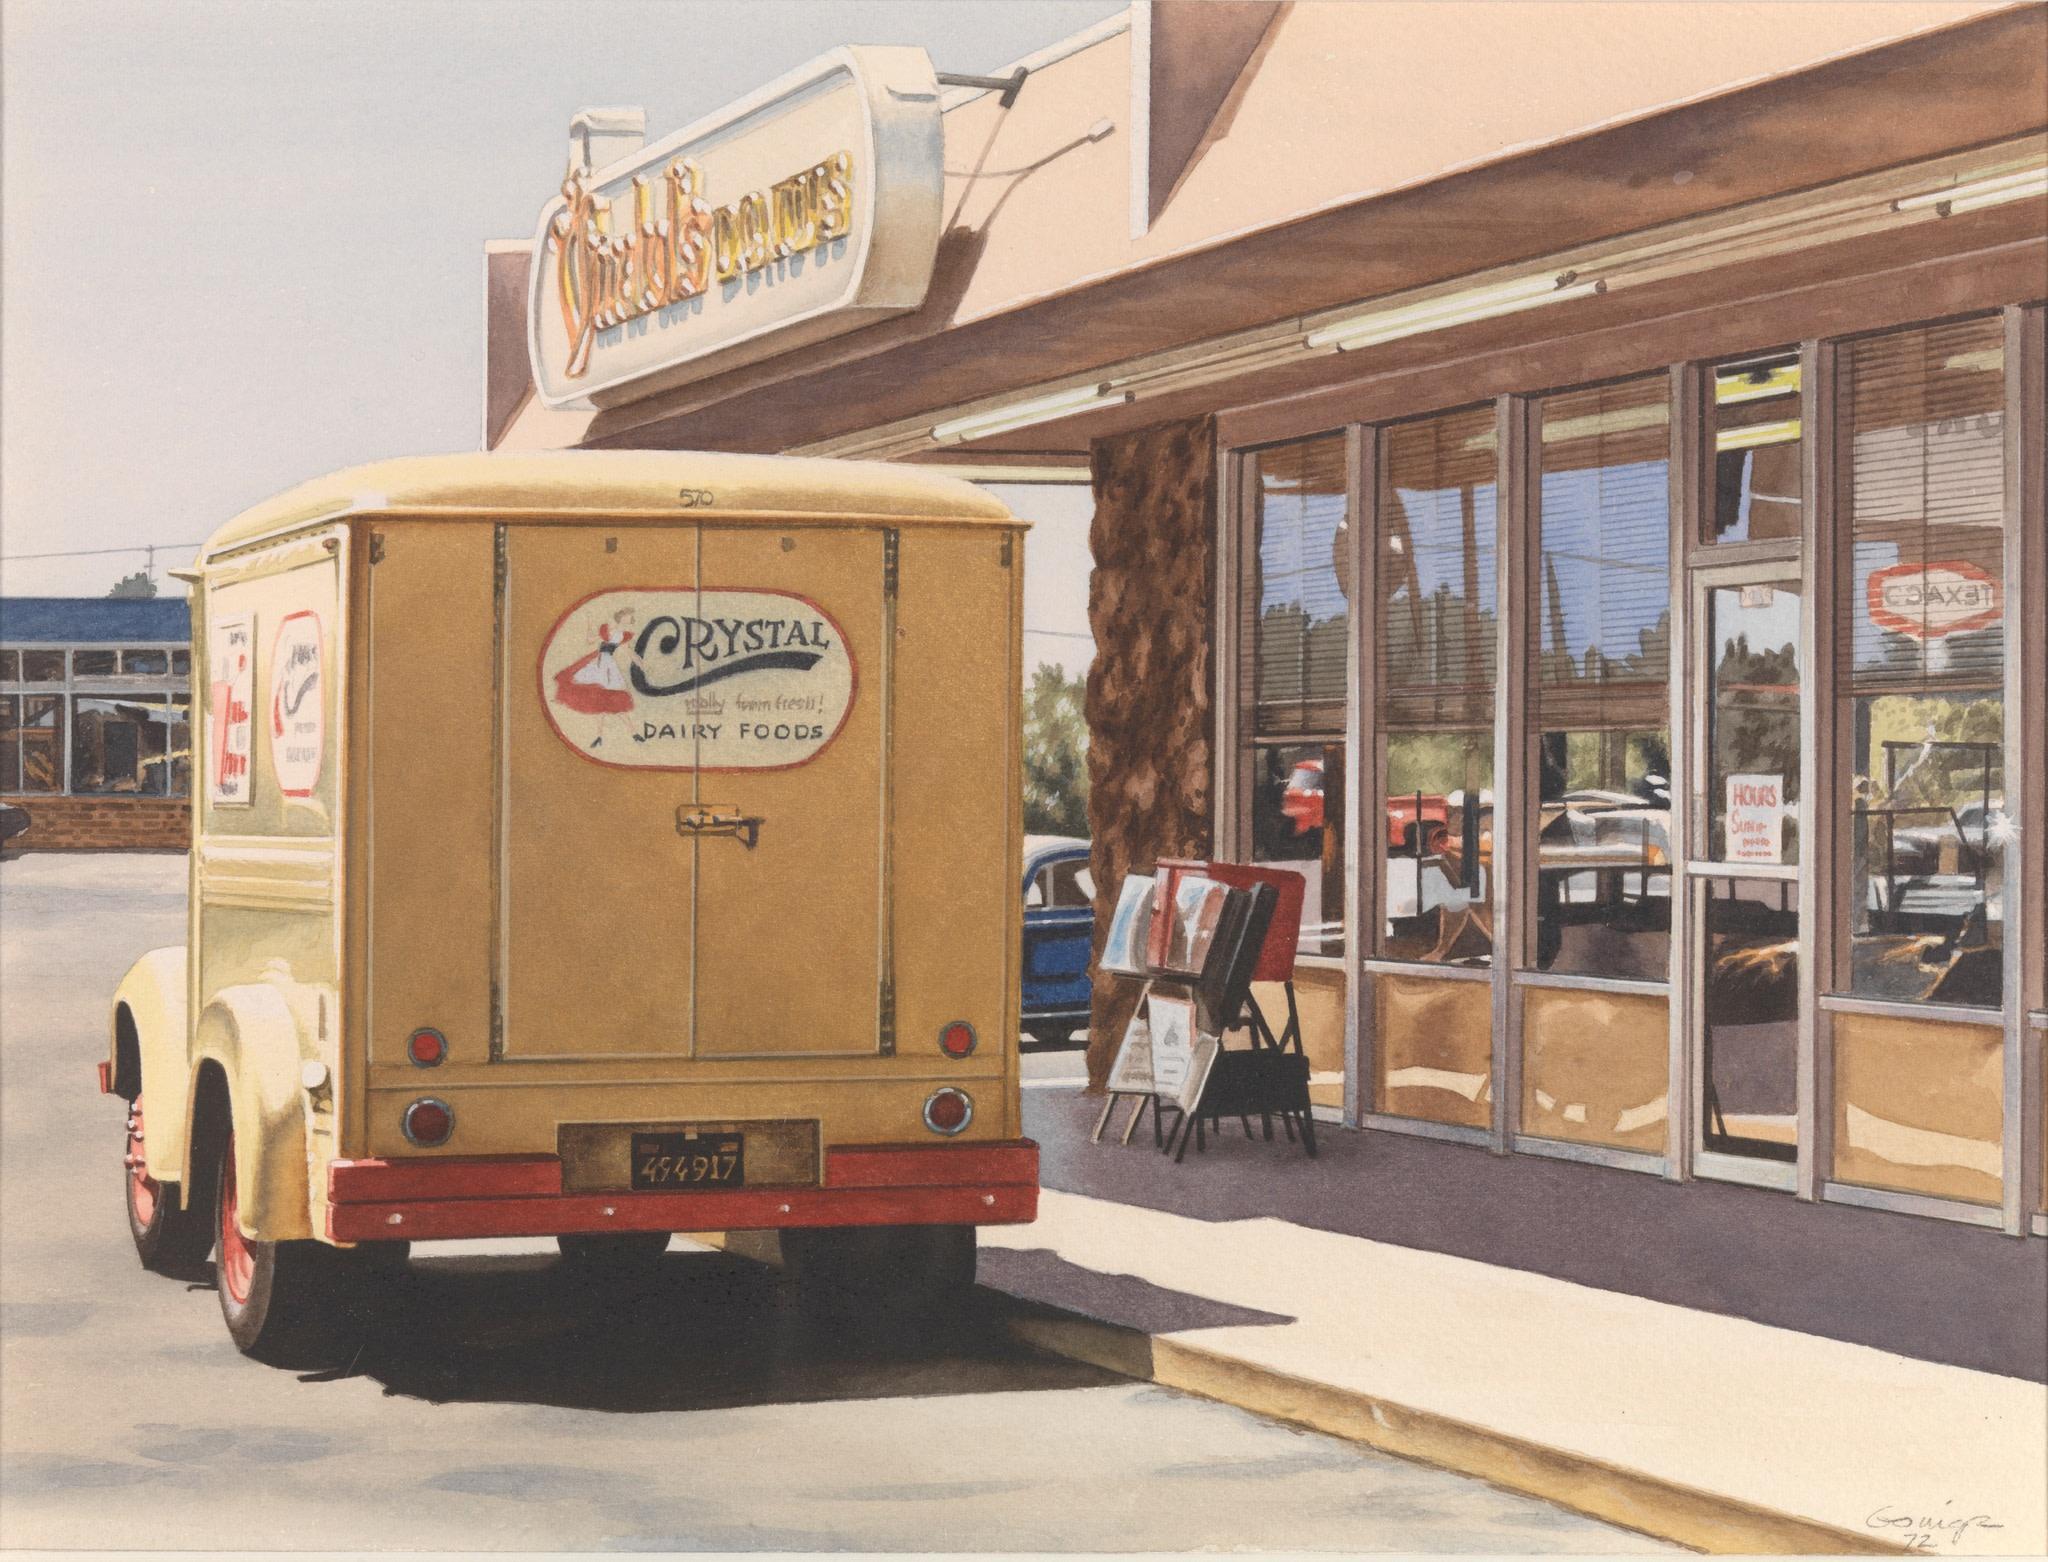 <span class=&#34;link fancybox-details-link&#34;><a href=&#34;/artists/113-ralph-goings/works/1587/&#34;>View Detail Page</a></span><div class=&#34;artist&#34;><strong>Ralph Goings</strong></div> <div class=&#34;title&#34;><em>Crystal Delivery Truck</em>, 1972</div> <div class=&#34;medium&#34;>watercolour on paper</div> <div class=&#34;dimensions&#34;>23 x 30.5 cm</div>